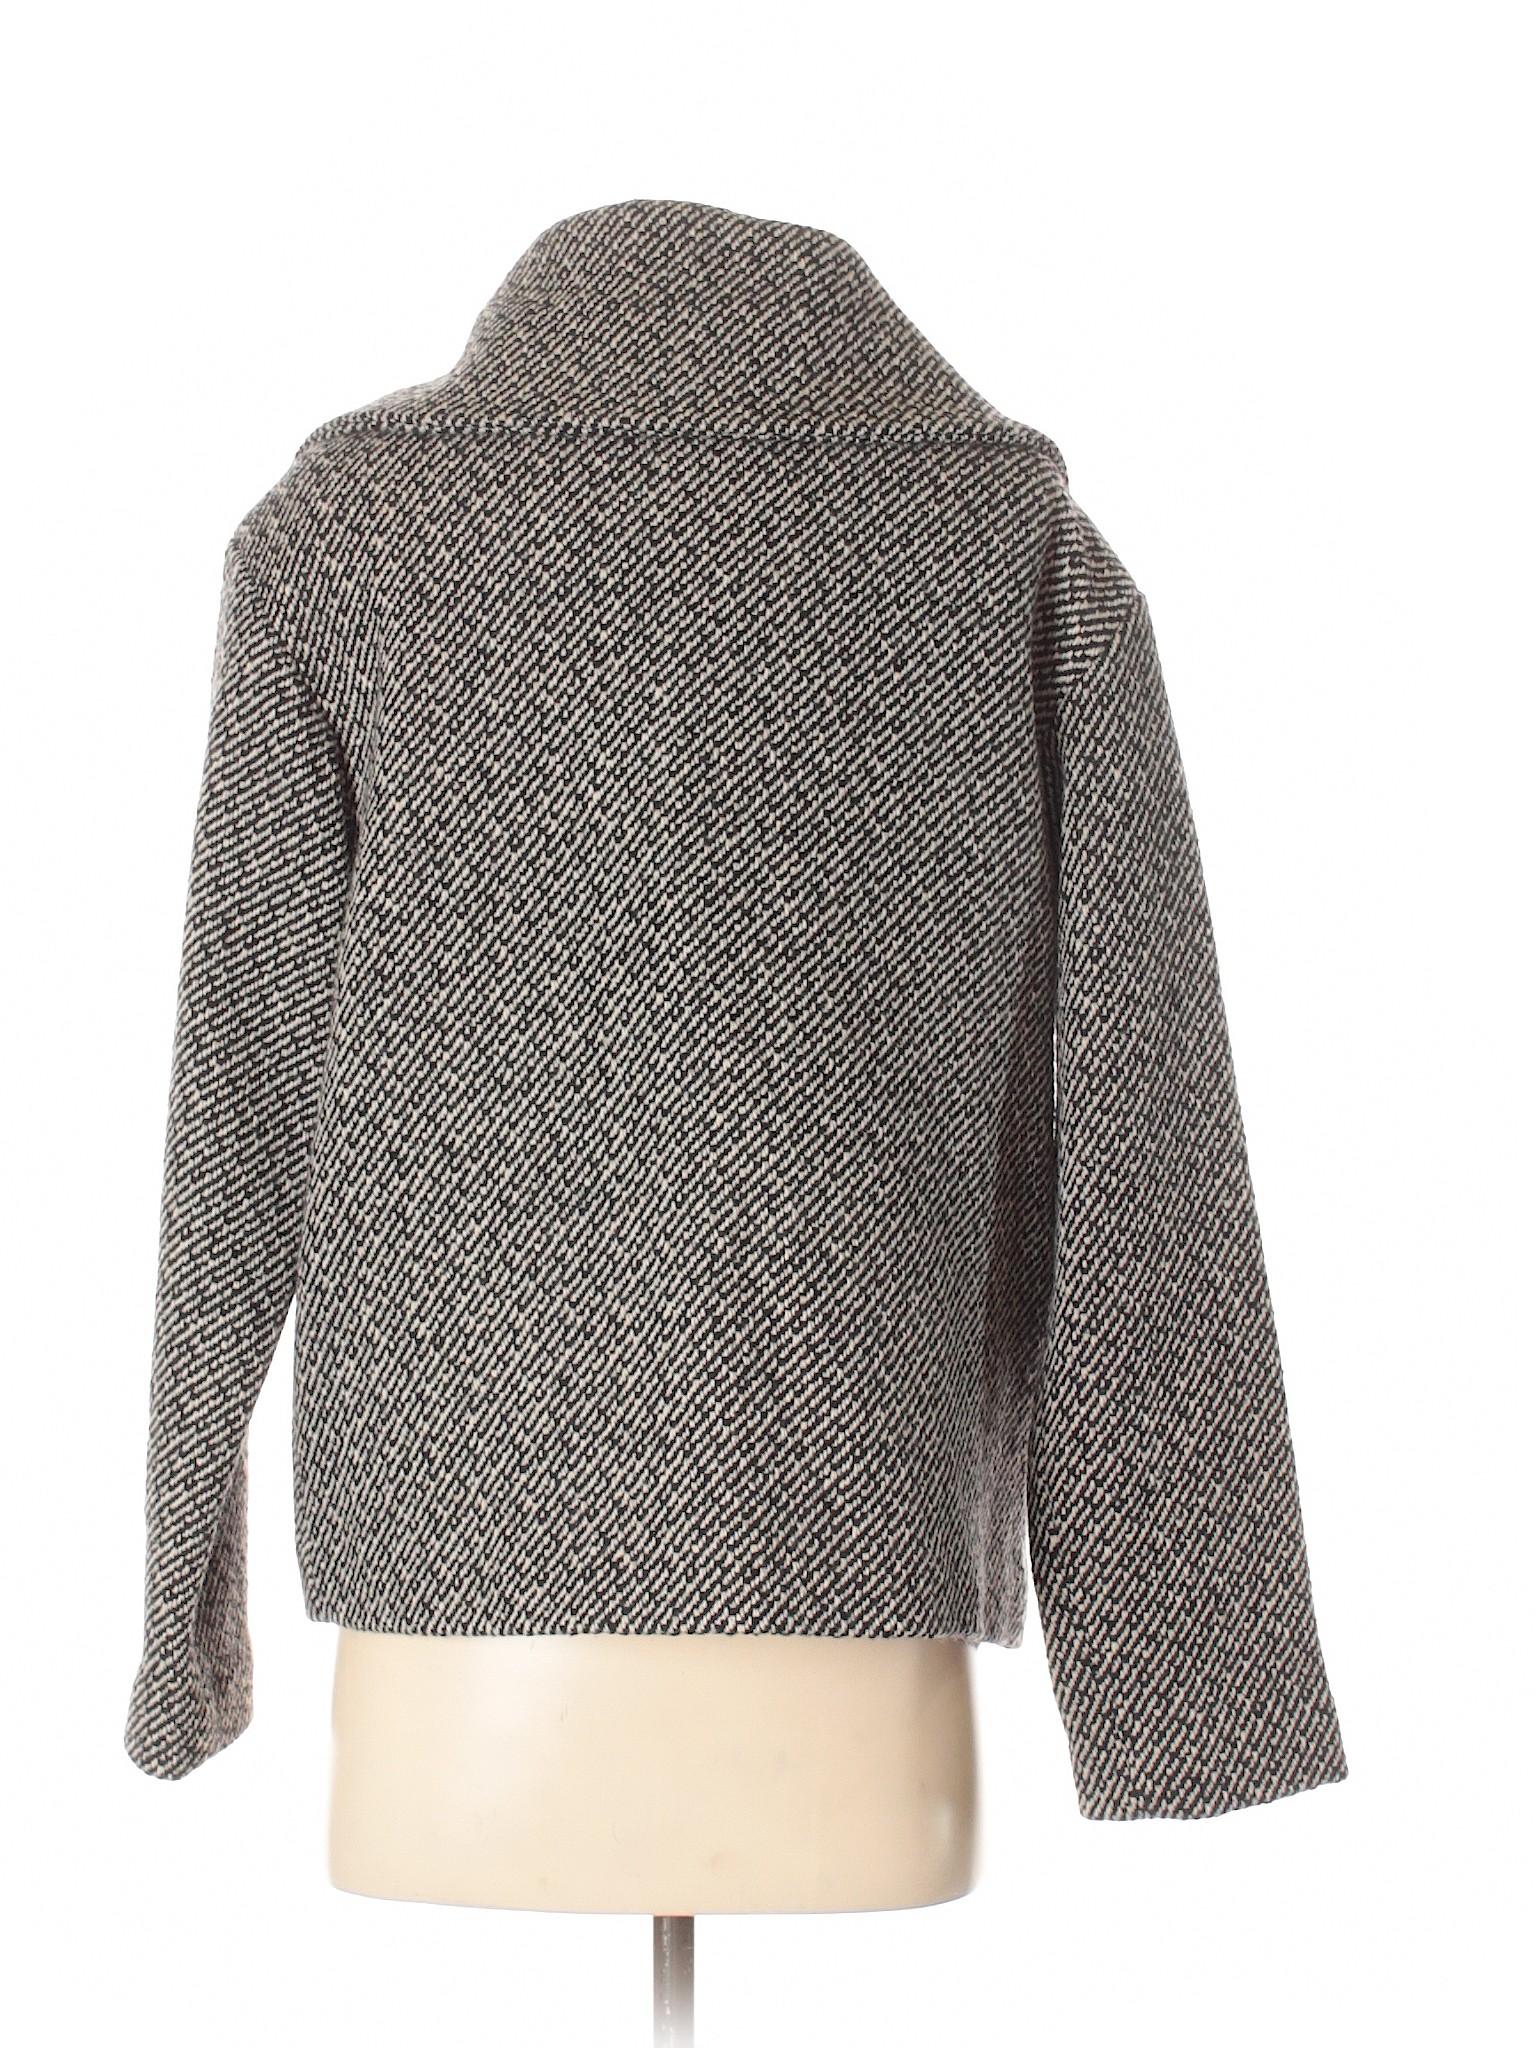 Wool Coat Wool Coat Gap Boutique winter Boutique Gap winter Boutique g48x7